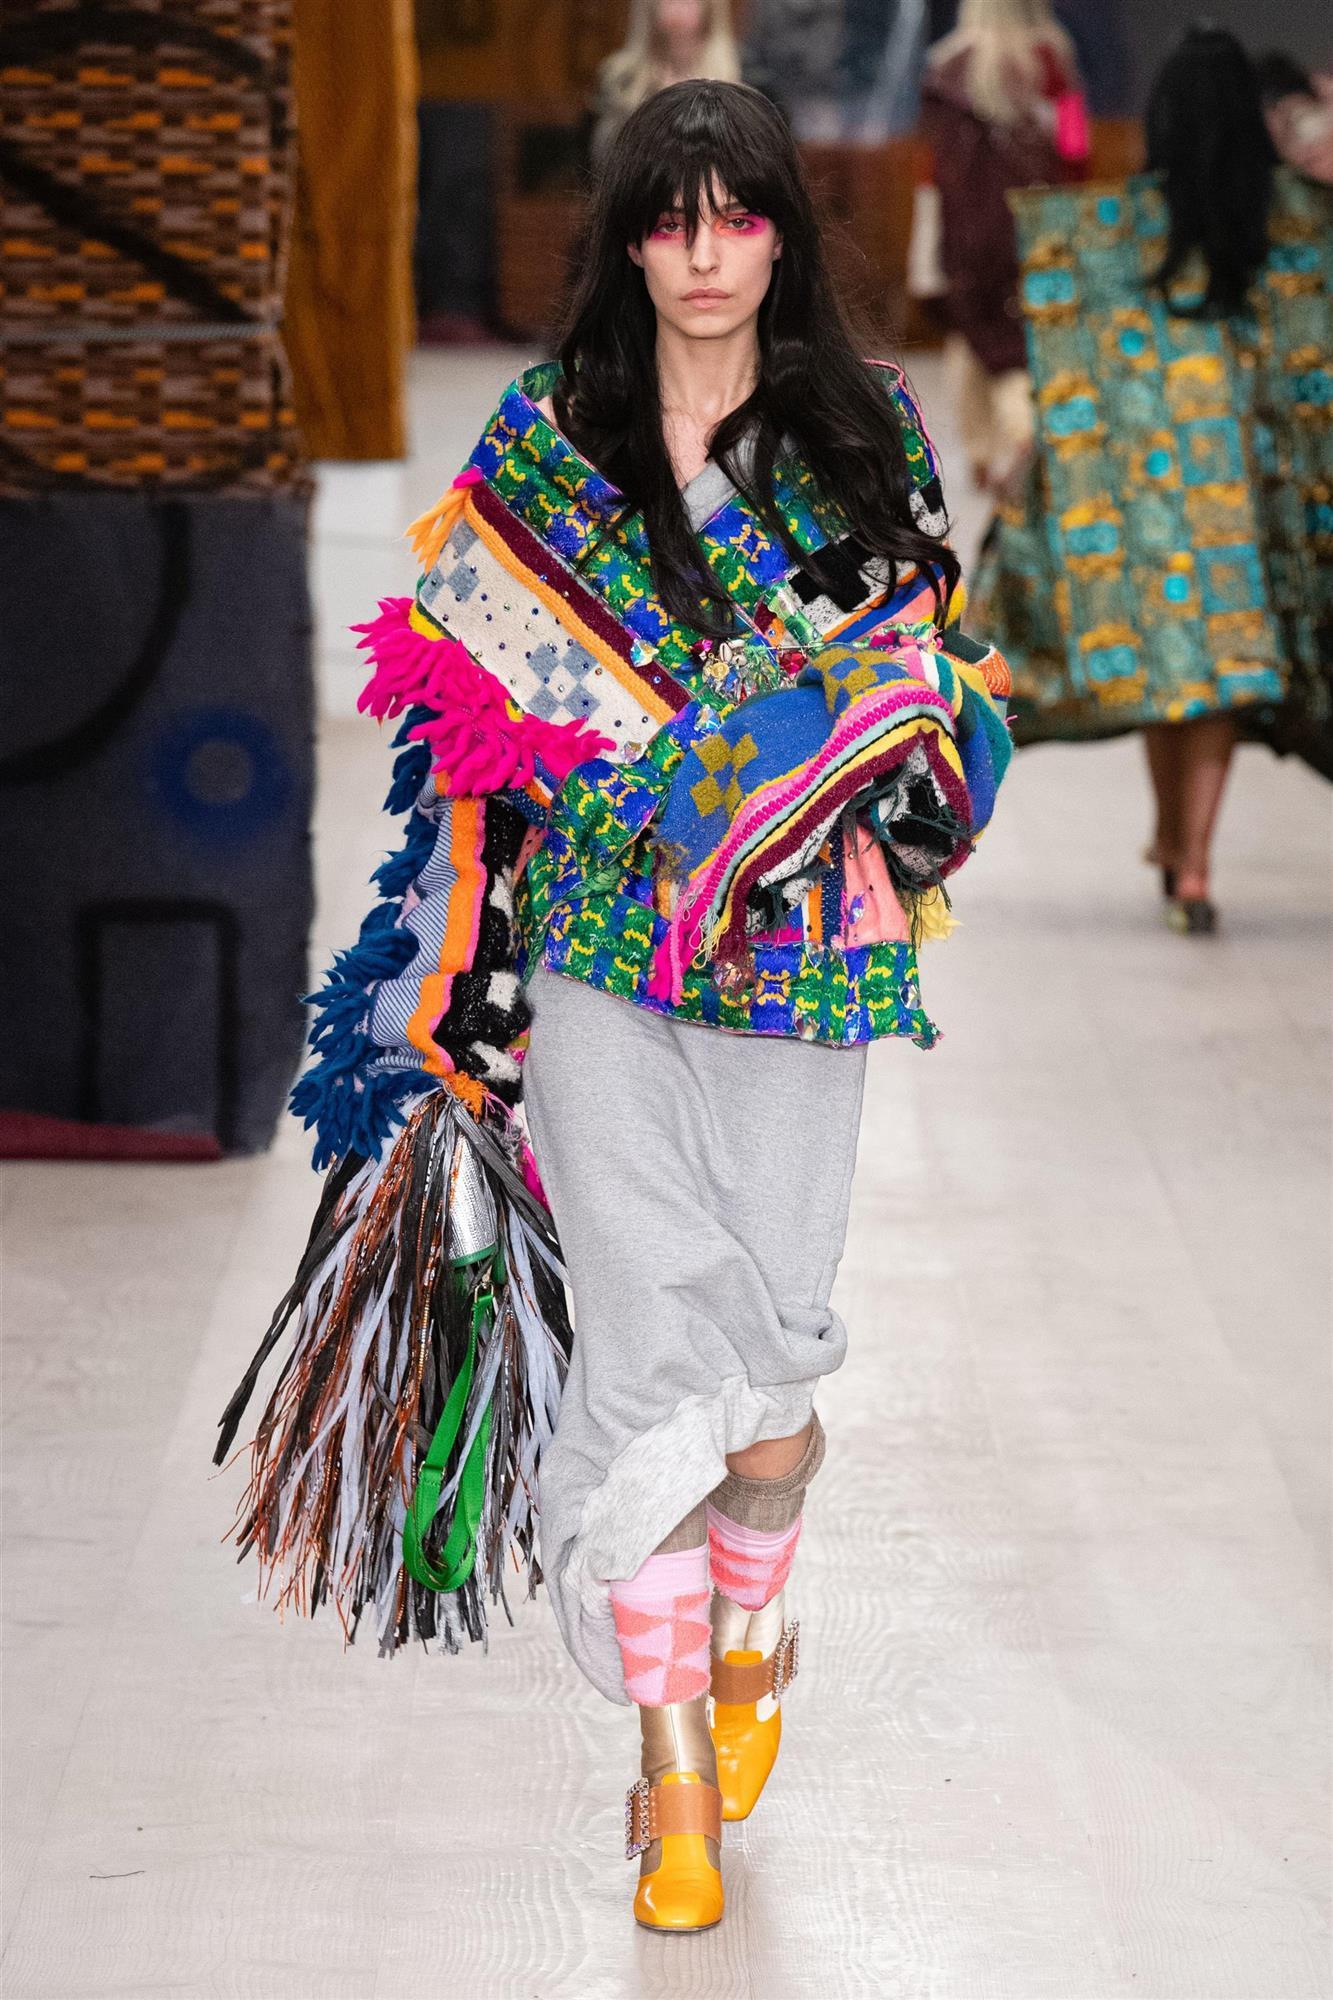 Semana de la moda de Londres, Matty Bovan